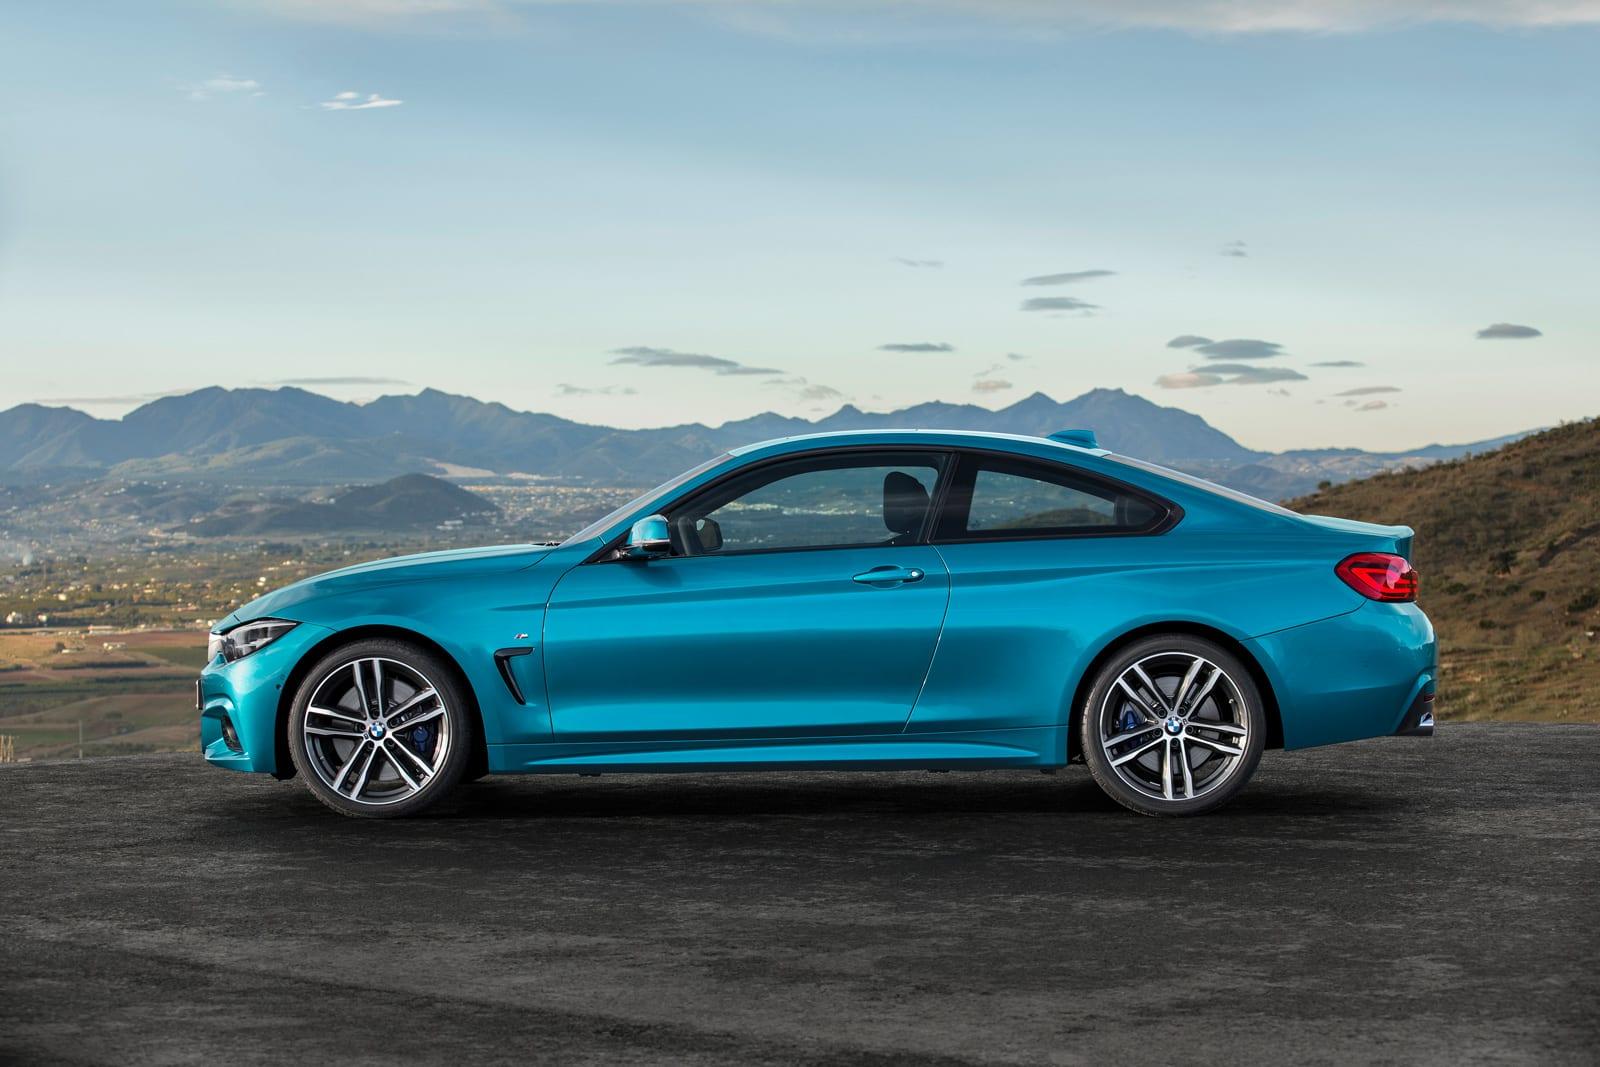 BMW's car subscription pilot program starts at $2,000 per month